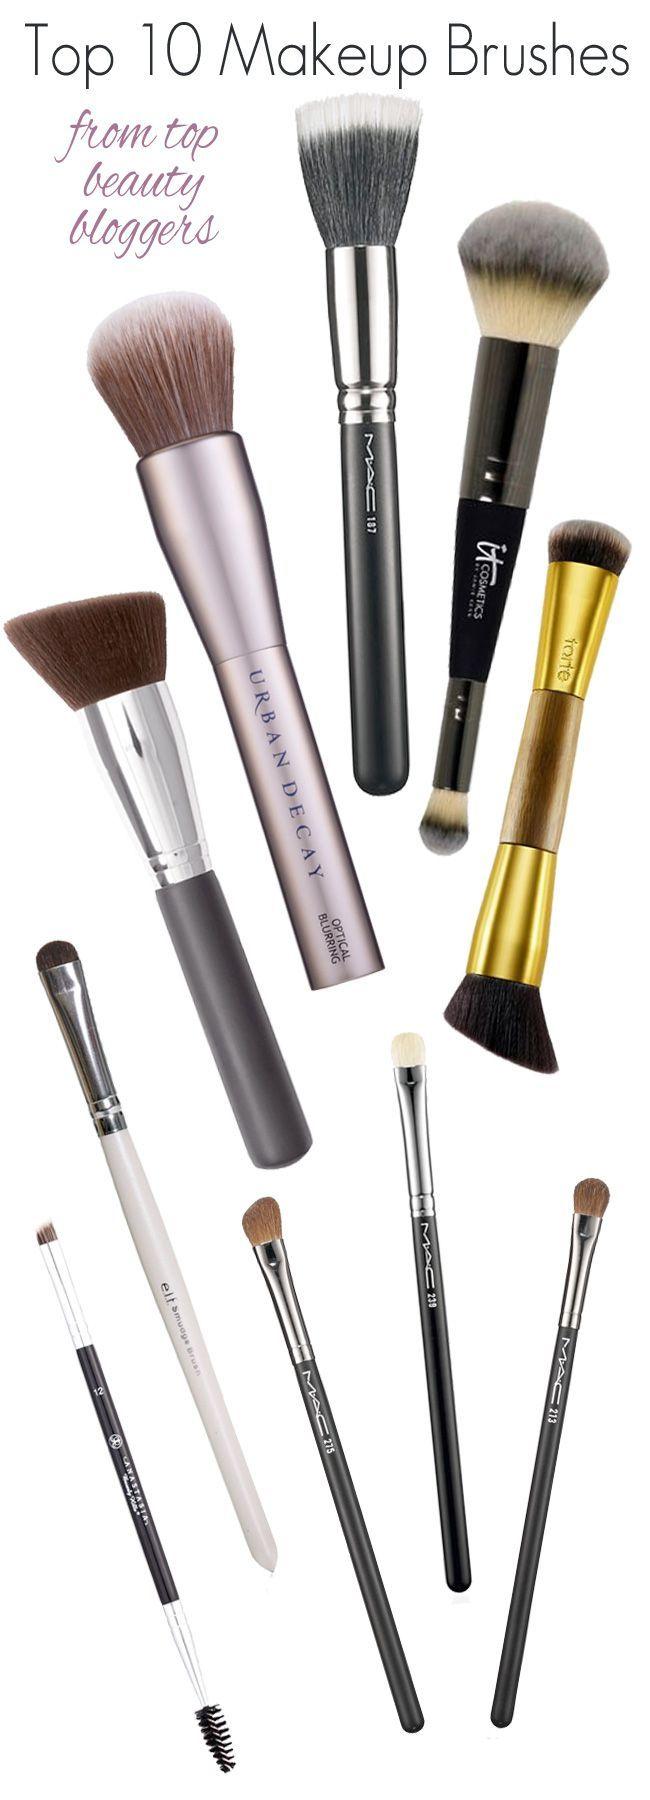 Top 10 Makeup Brushes. Best makeup products, Best makeup